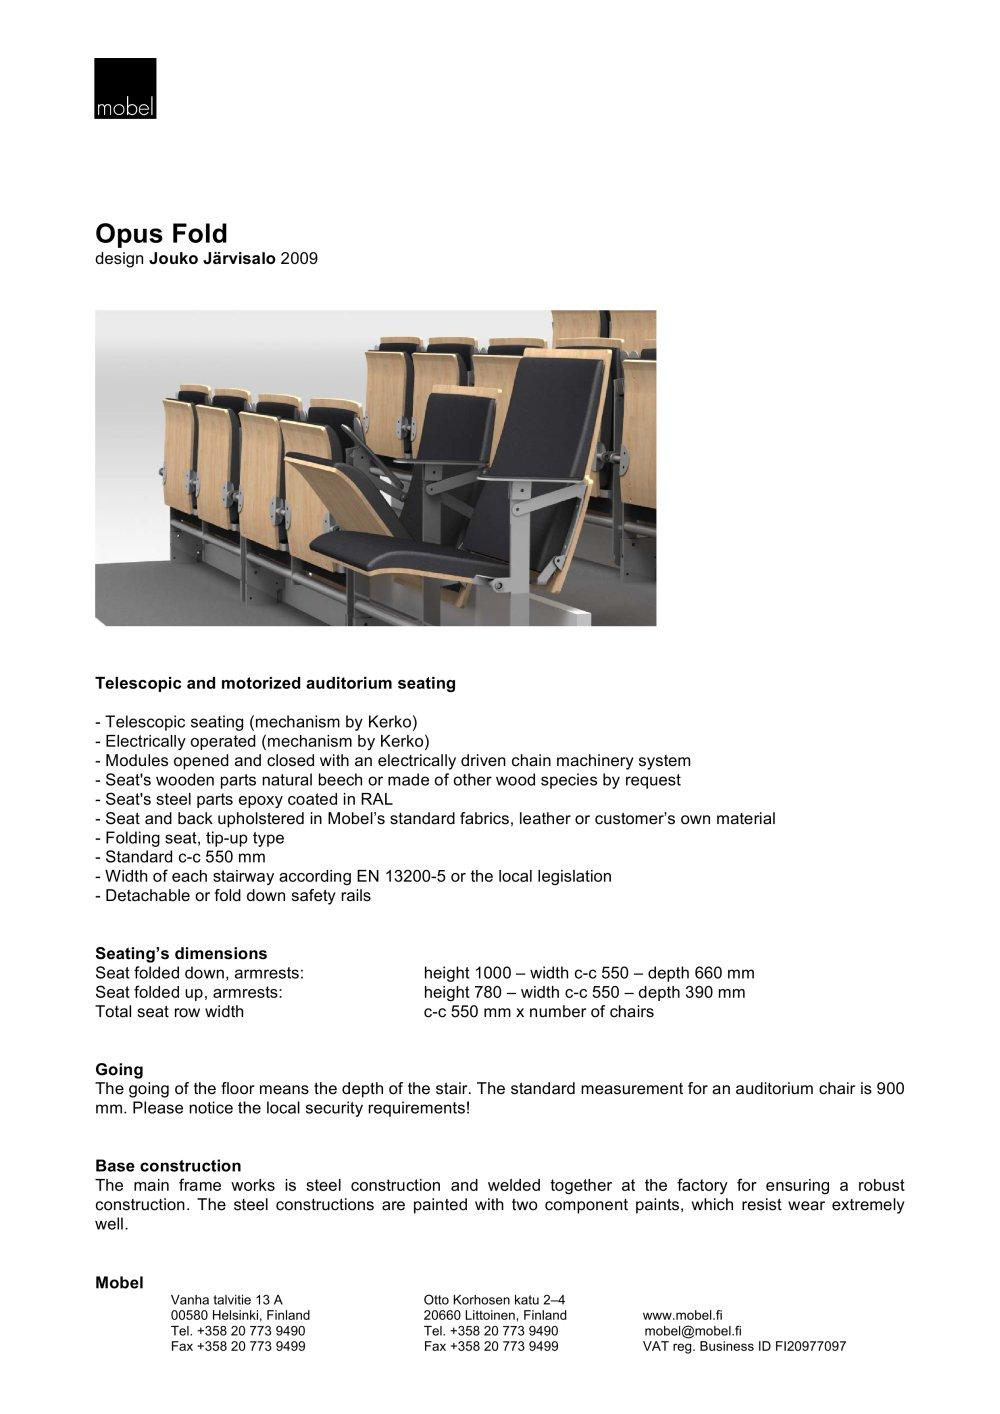 Opus fold - mobel - PDF Catalogues | Documentation | Brochures